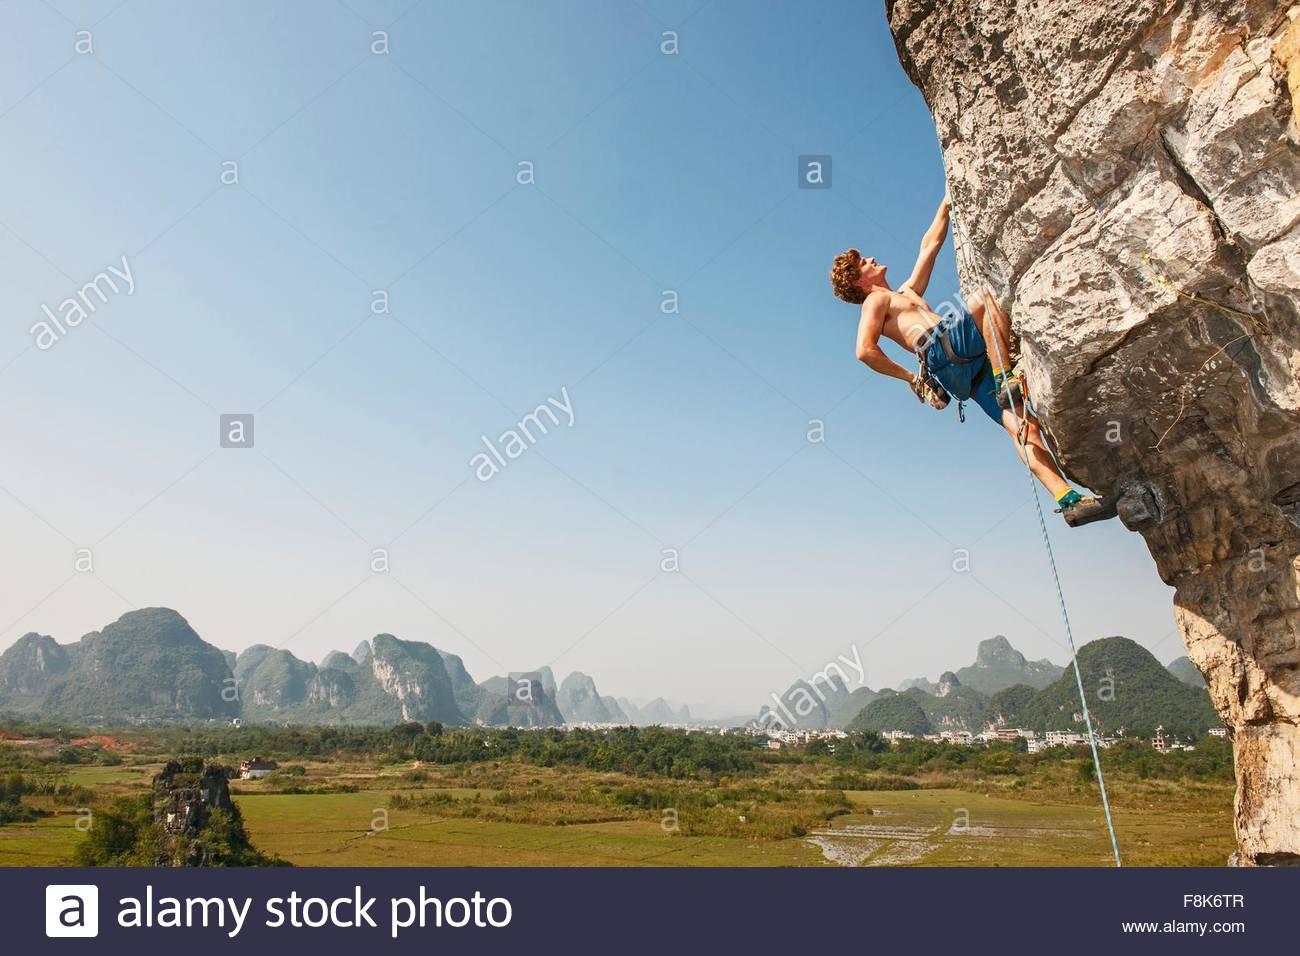 Male climber climbing on the Egg - a limestone cliff in Yangshuo, Guangxi Zhuang, China - Stock Image